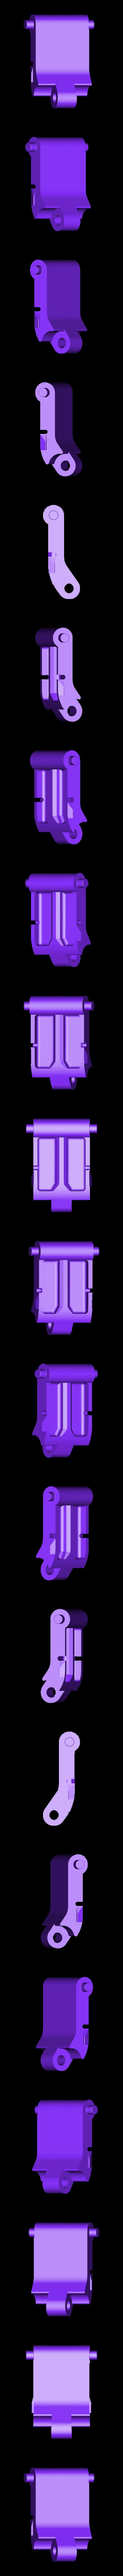 Big side probe.stl Download STL file Humminbird 525 echo sounder • Template to 3D print, francknos